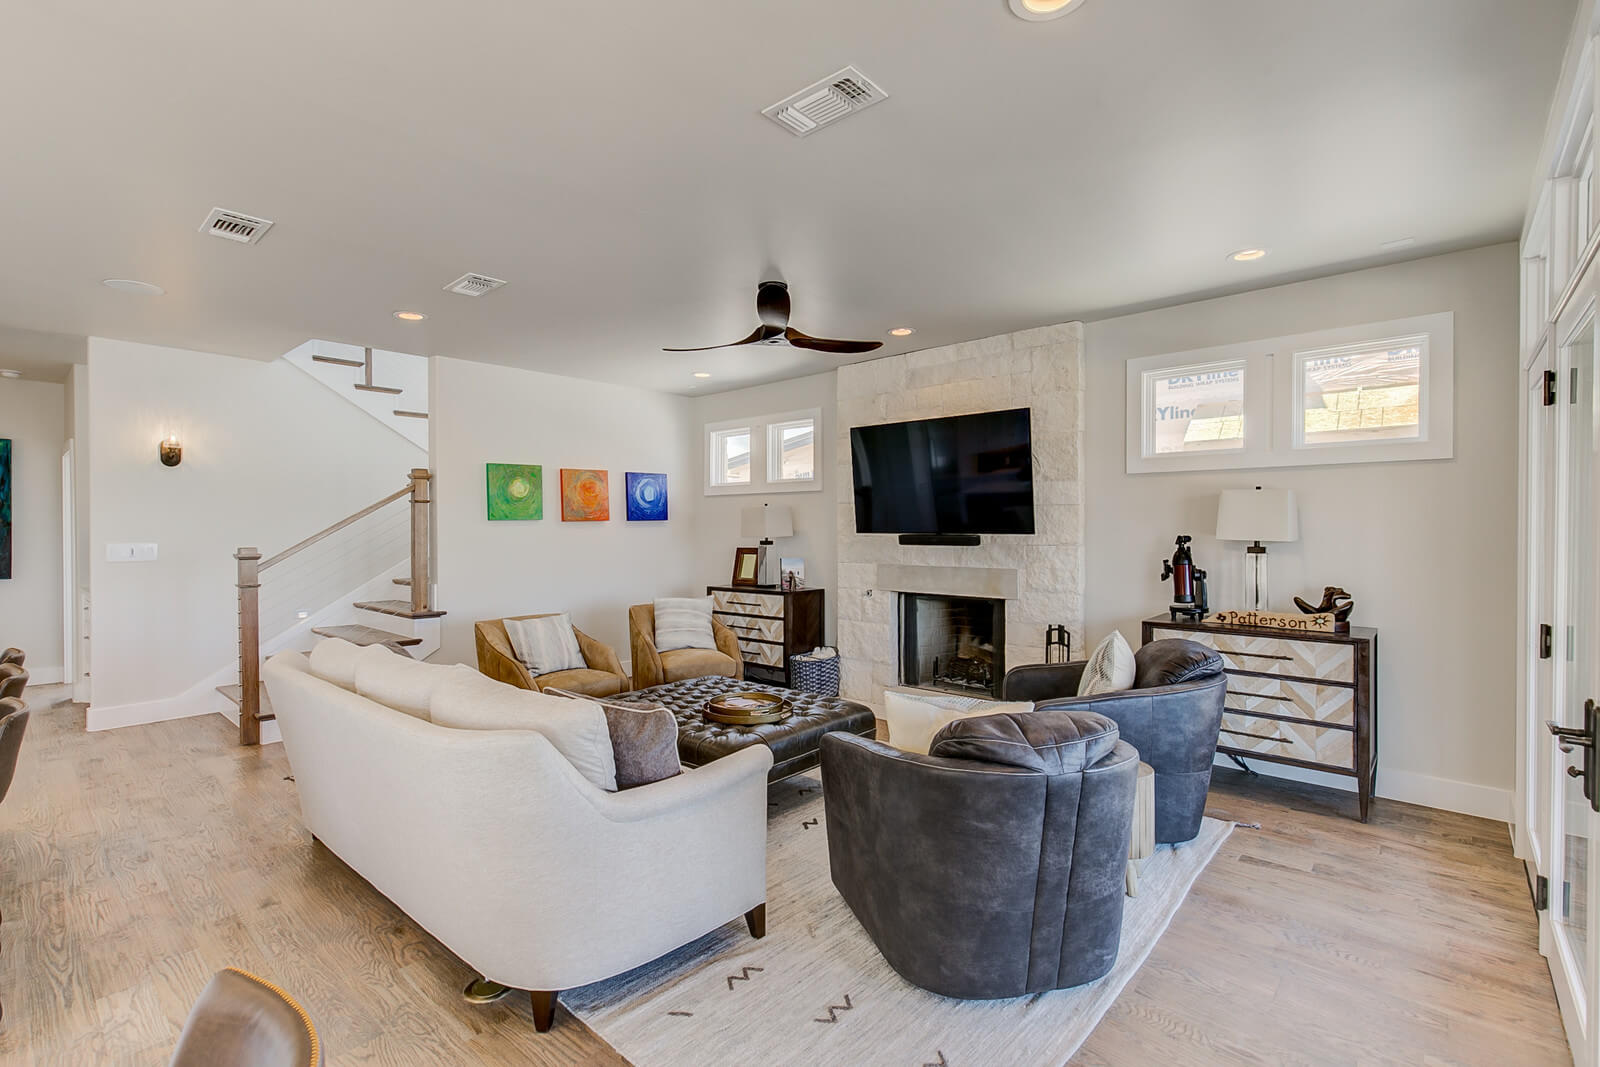 Steve-Bumpas-Custom-Homes-The-Residences-at-Rough-Creek-Lodge-Beck-76.jpg